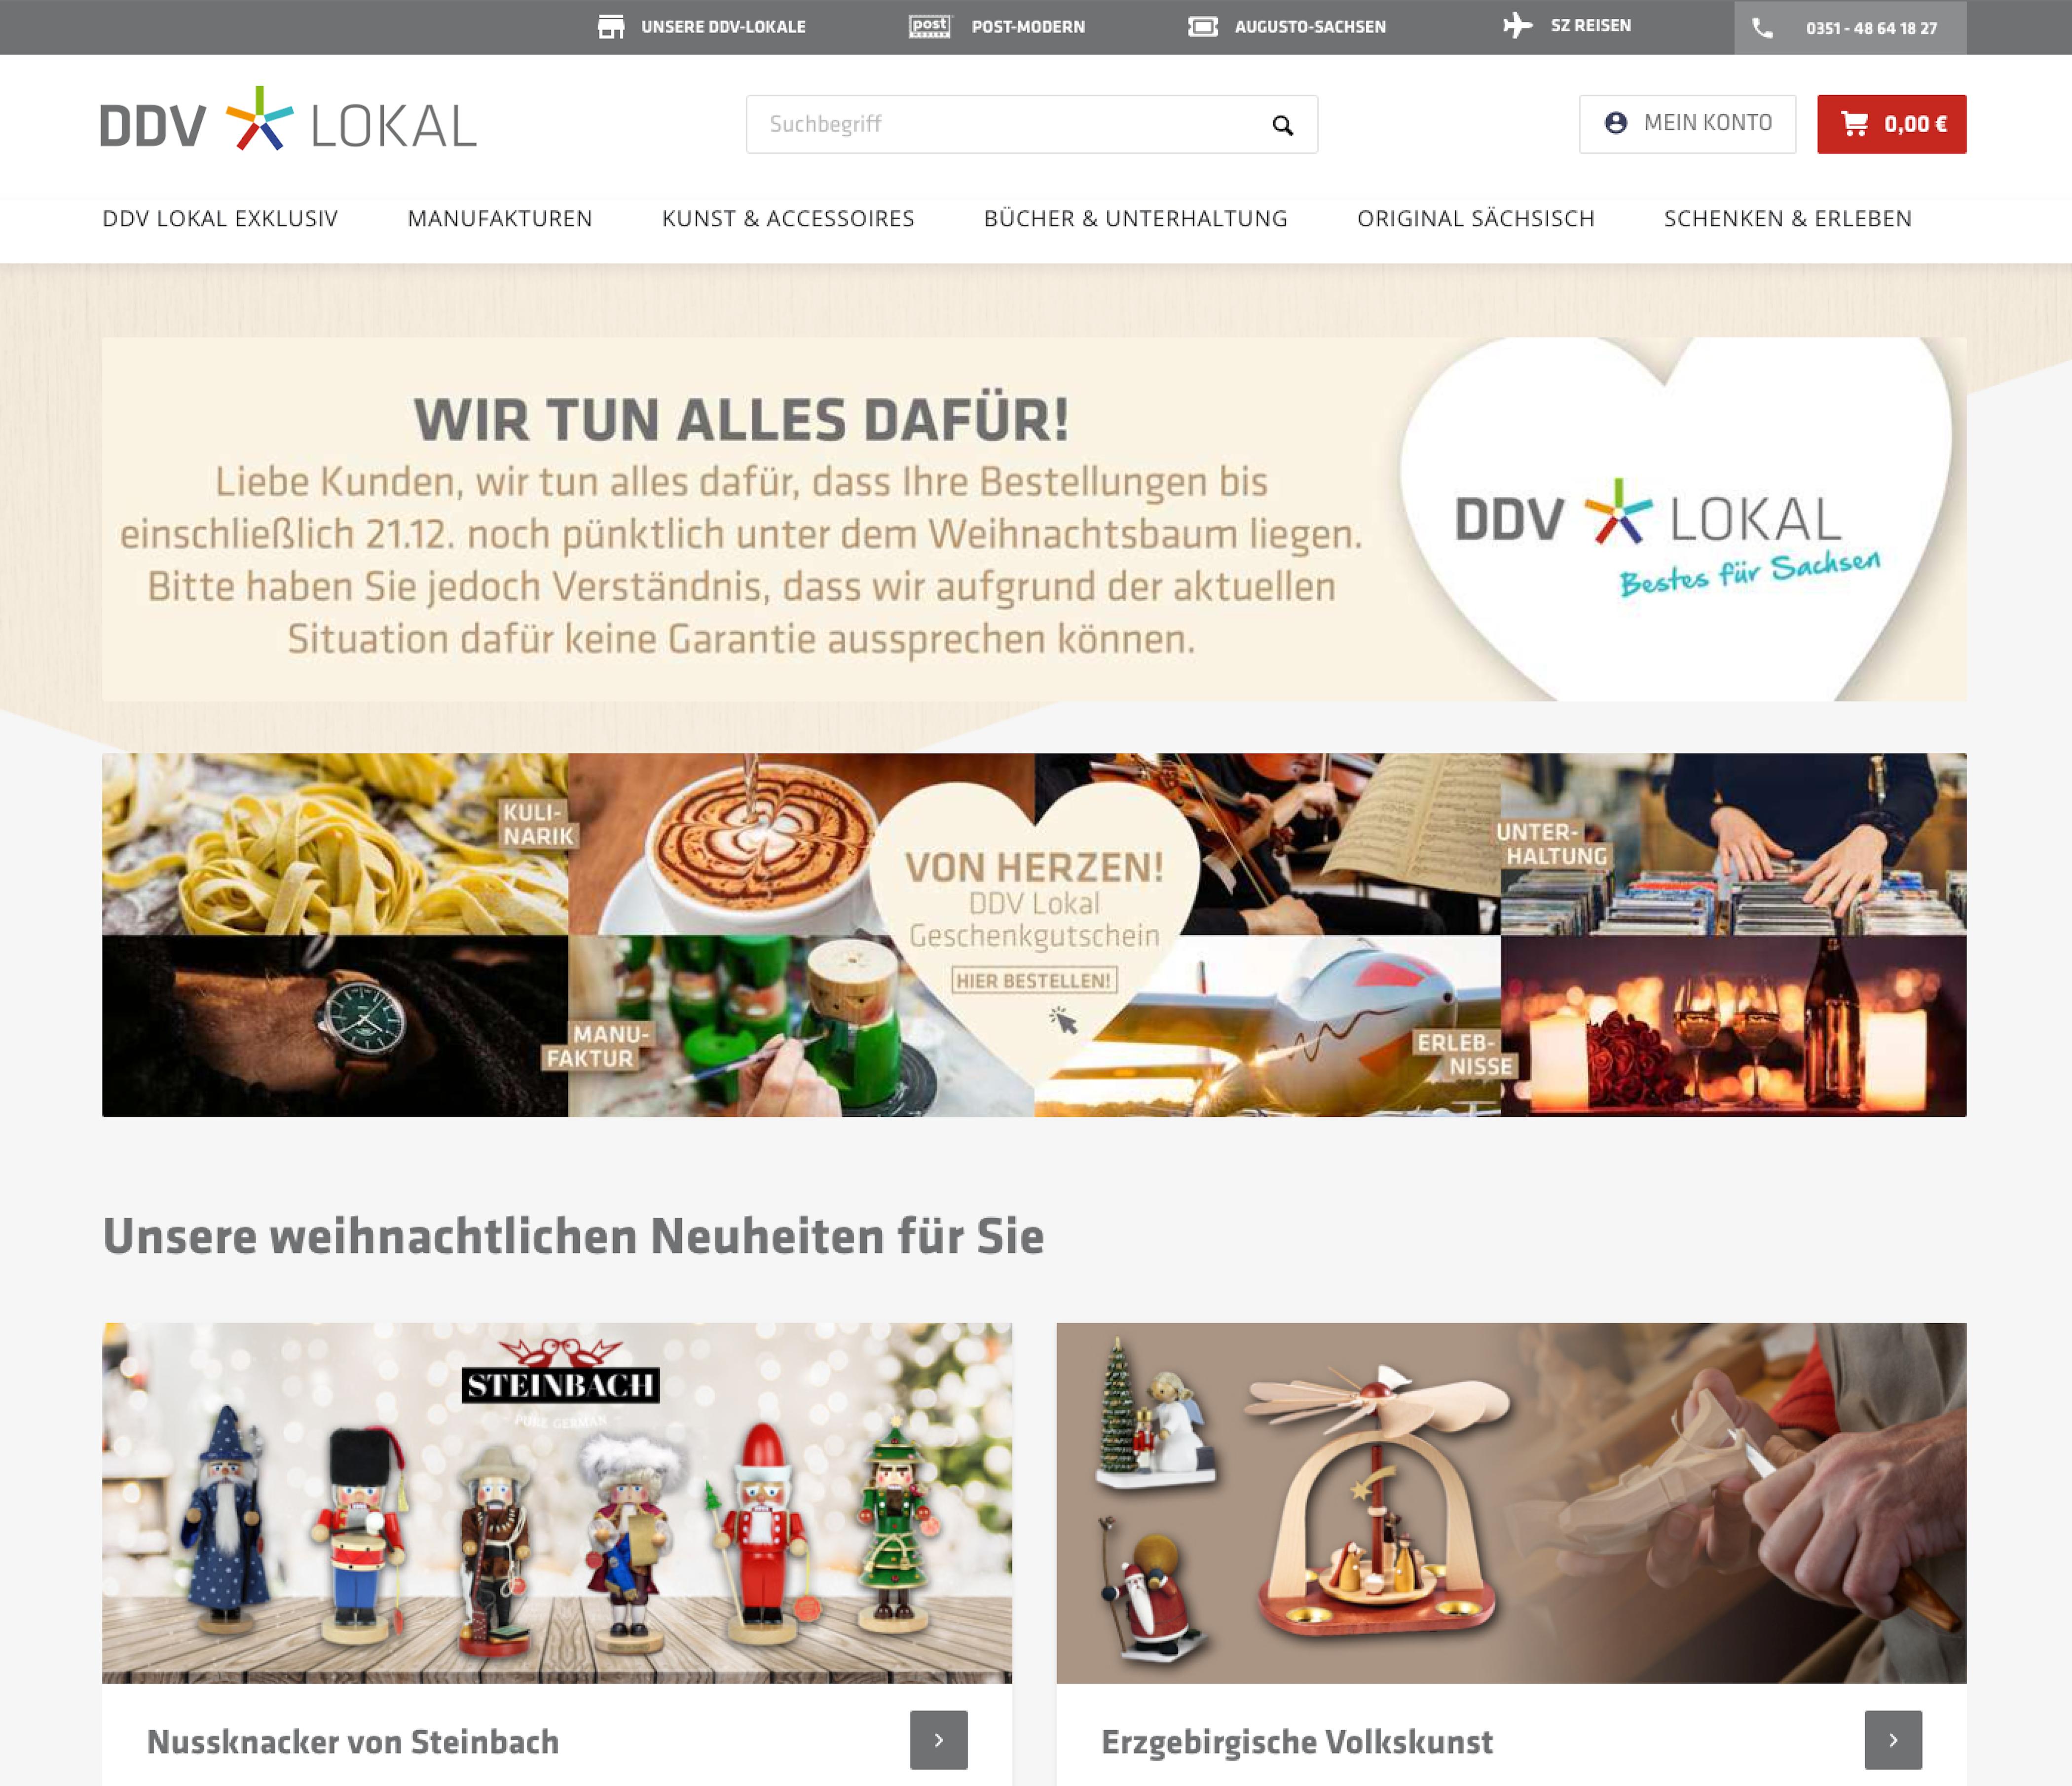 DDV Lokal - der neue Onlineshop